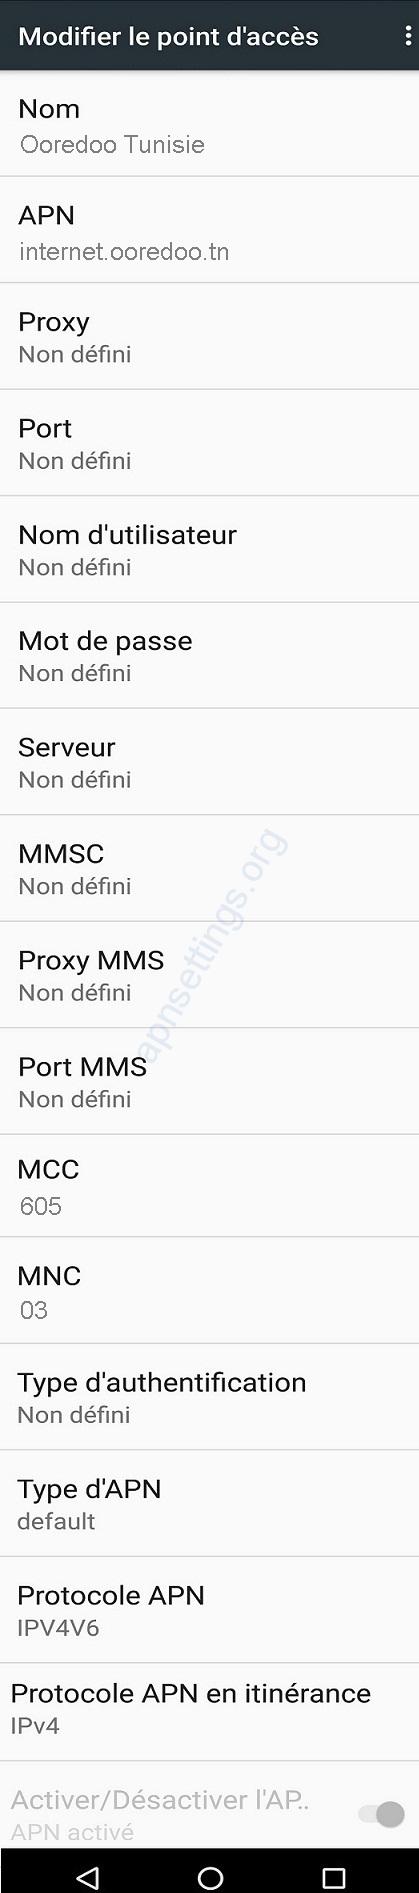 Configuration Internet 4G Ooredoo Tunisie